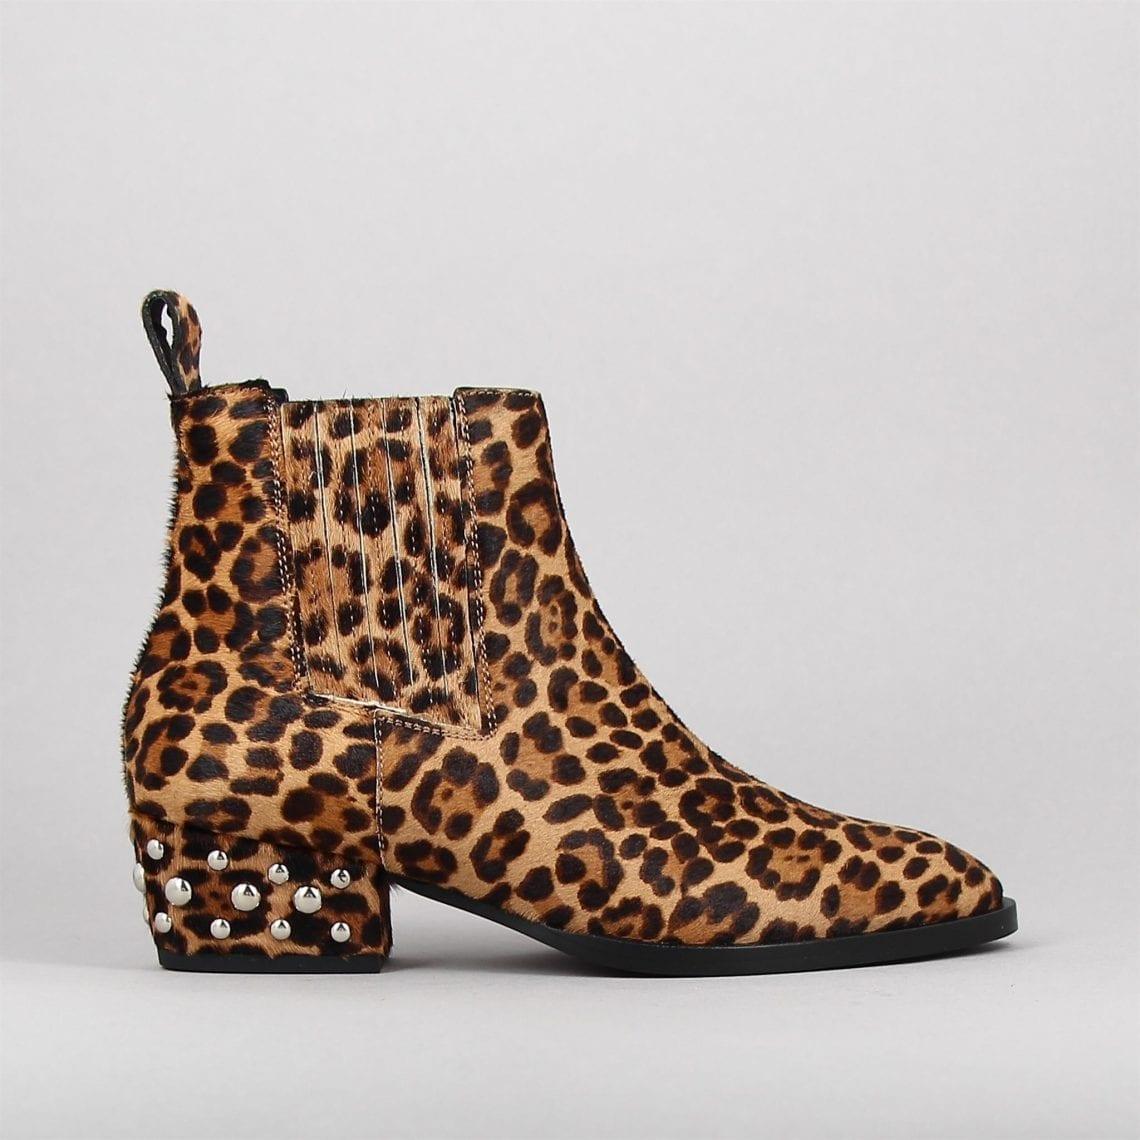 10967-h1819-leopard-3063815-0.jpg